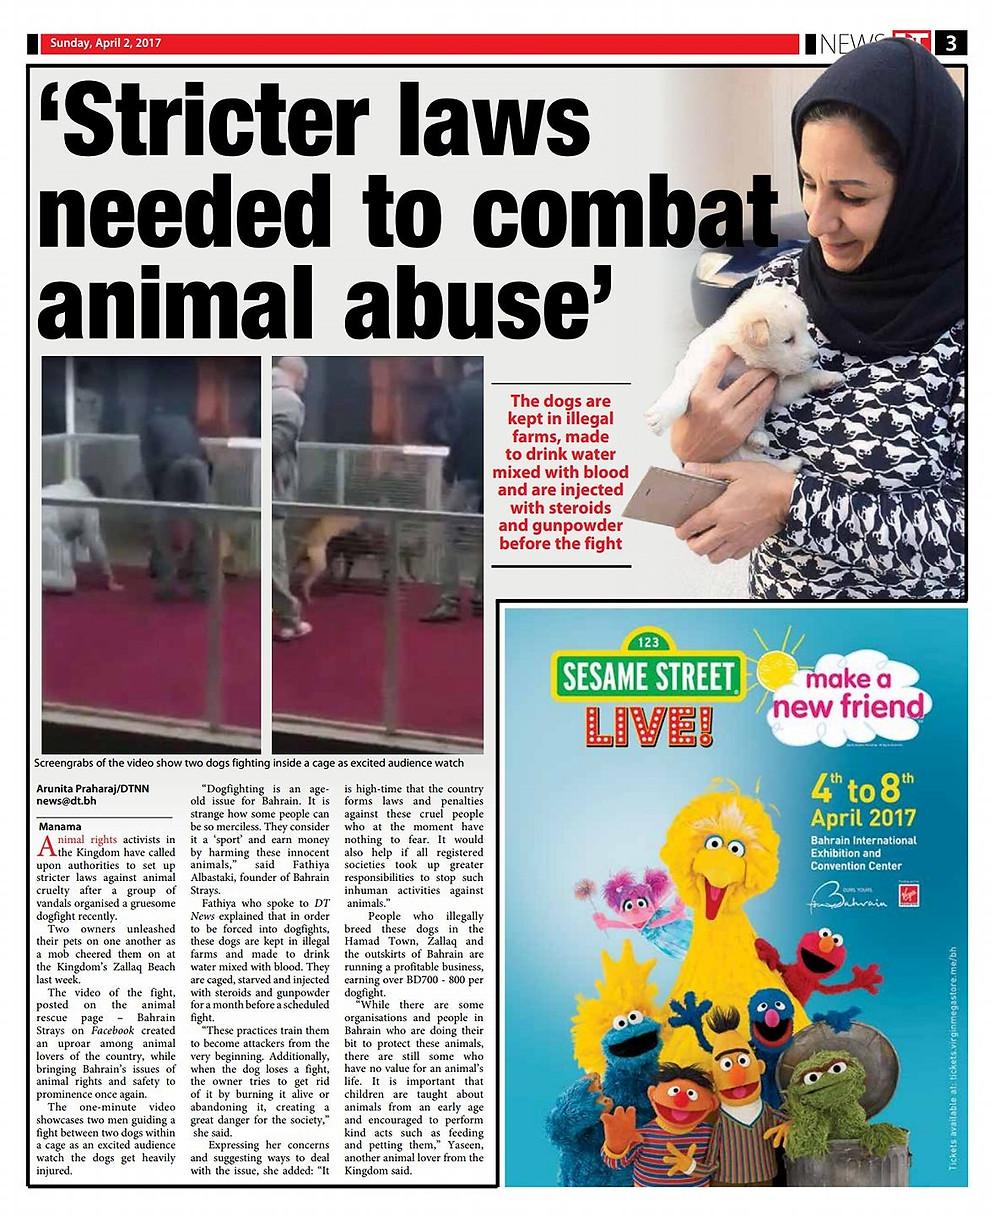 Fathiya raises awareness of the needs of animals in Bahrain